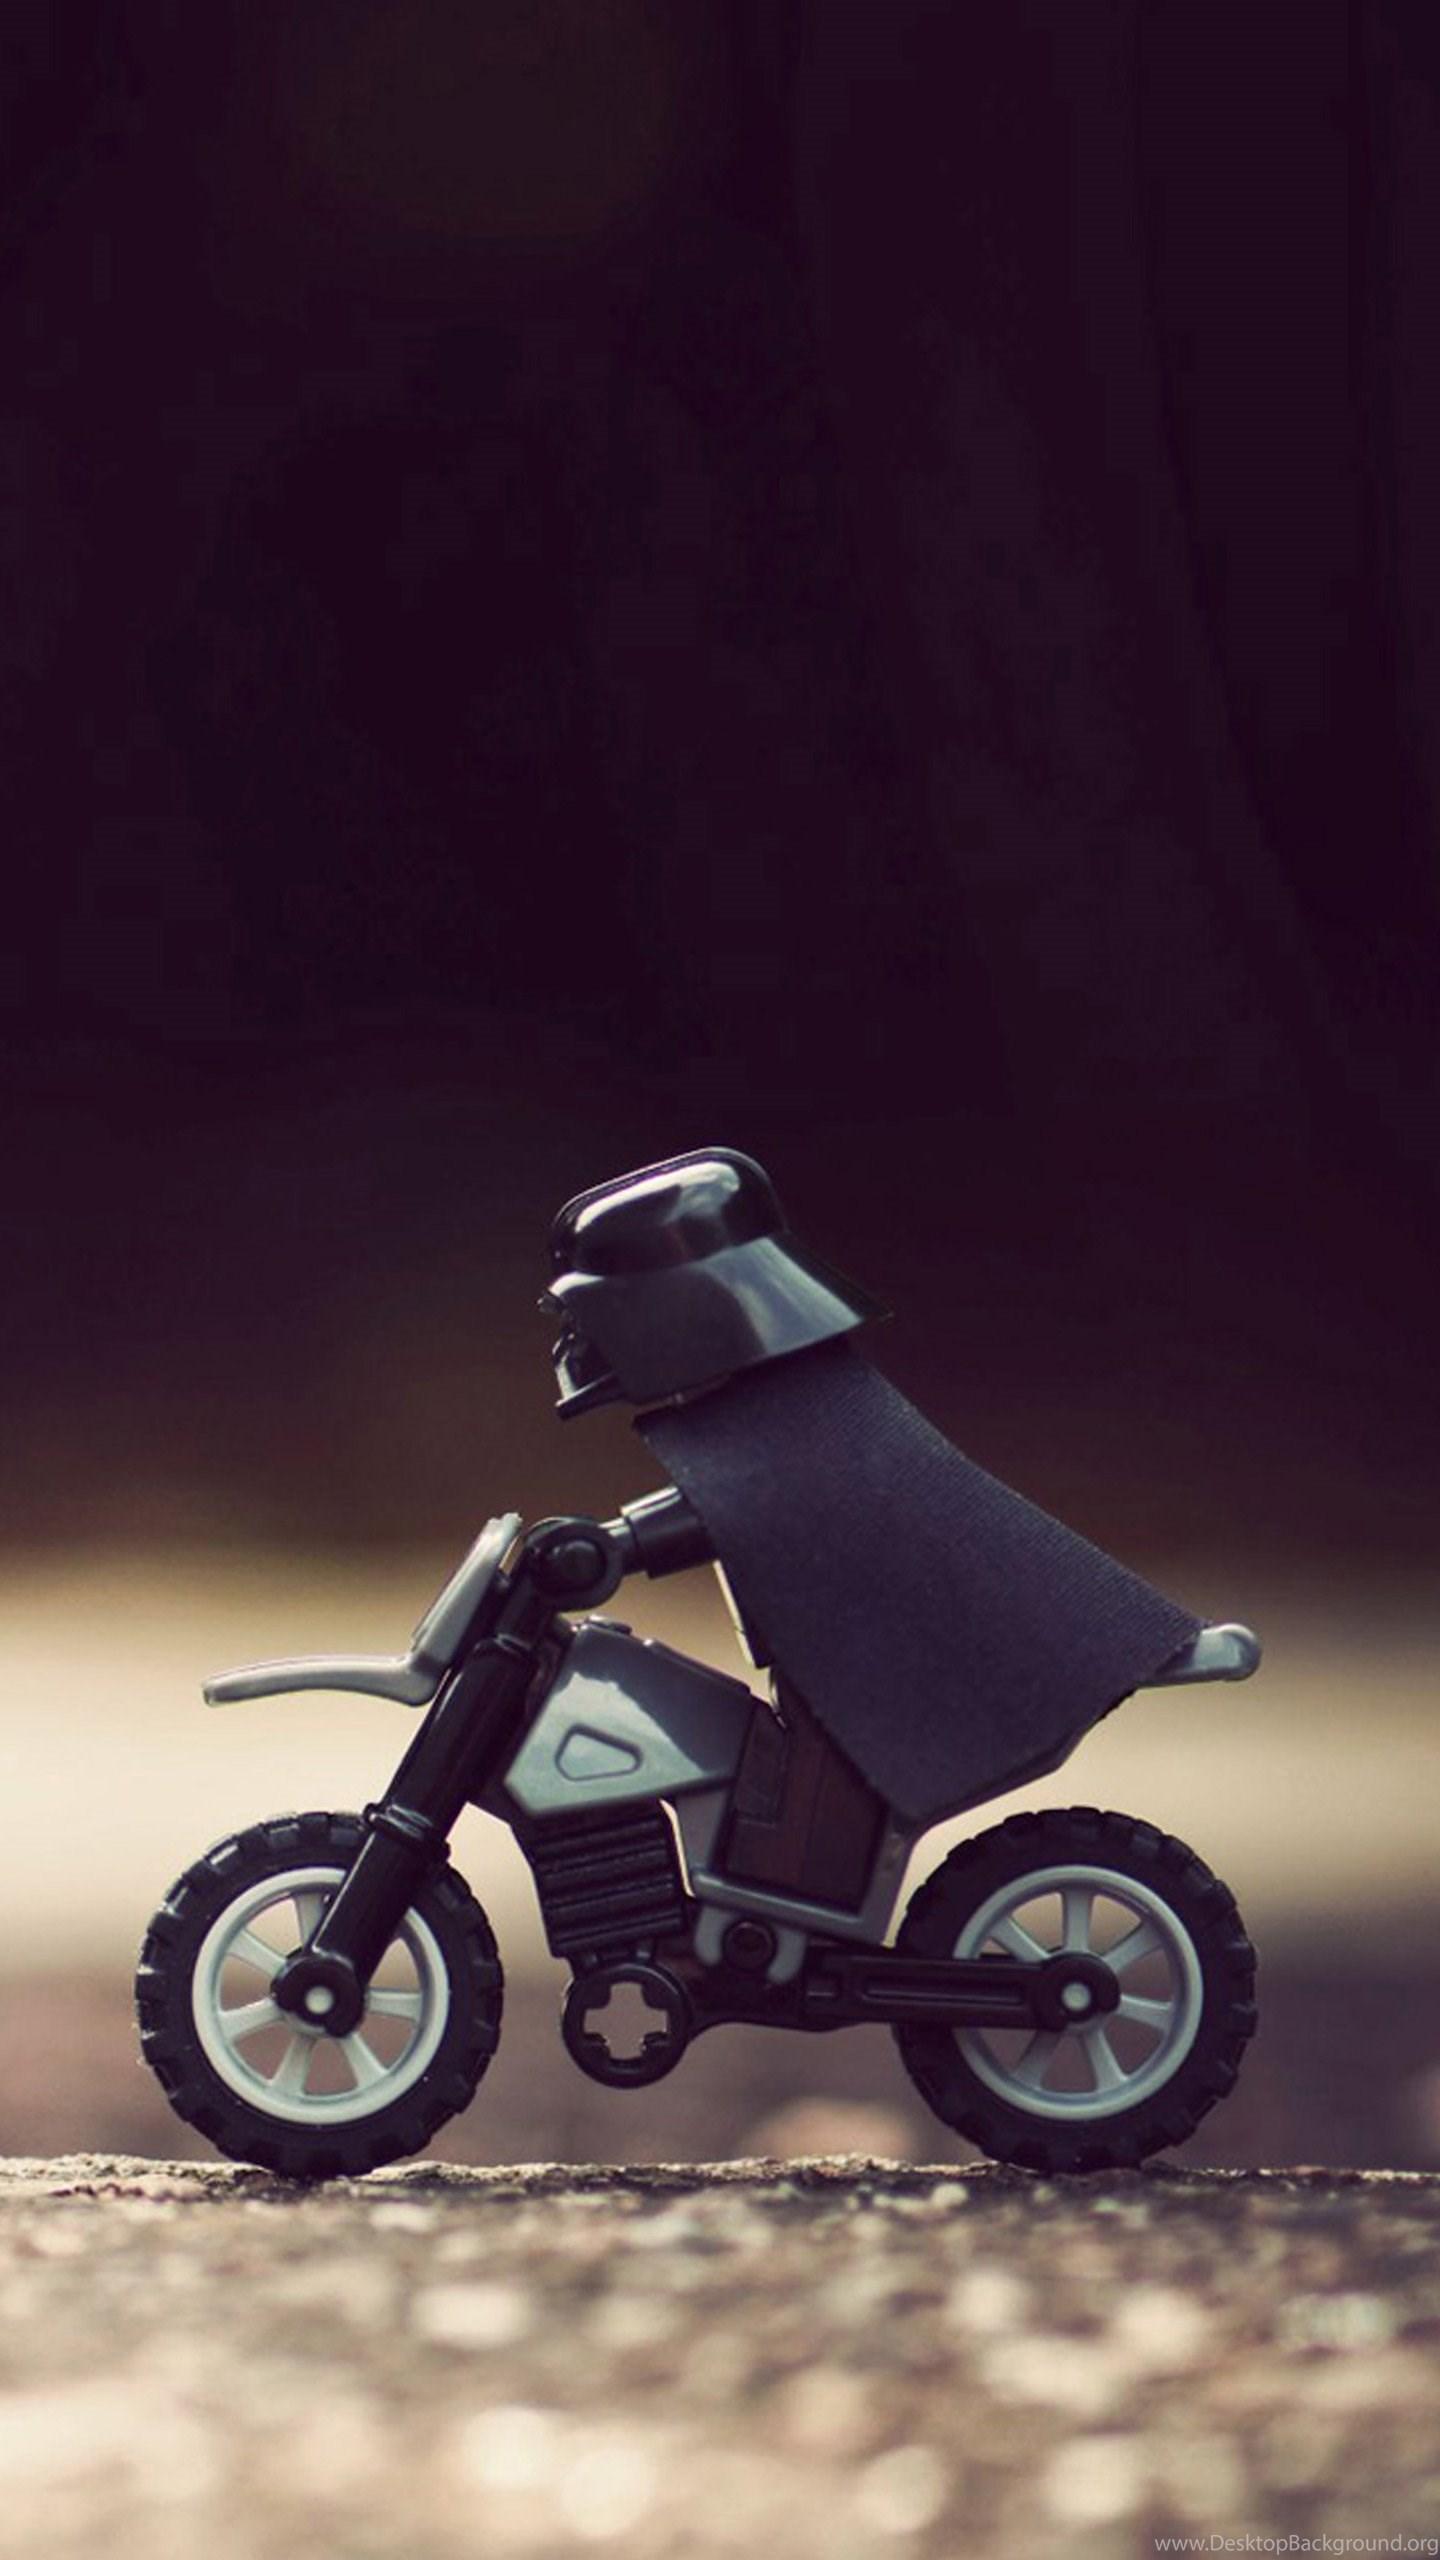 Lego Star Wars Wallpapers For Galaxy S6 Jpg Desktop Background